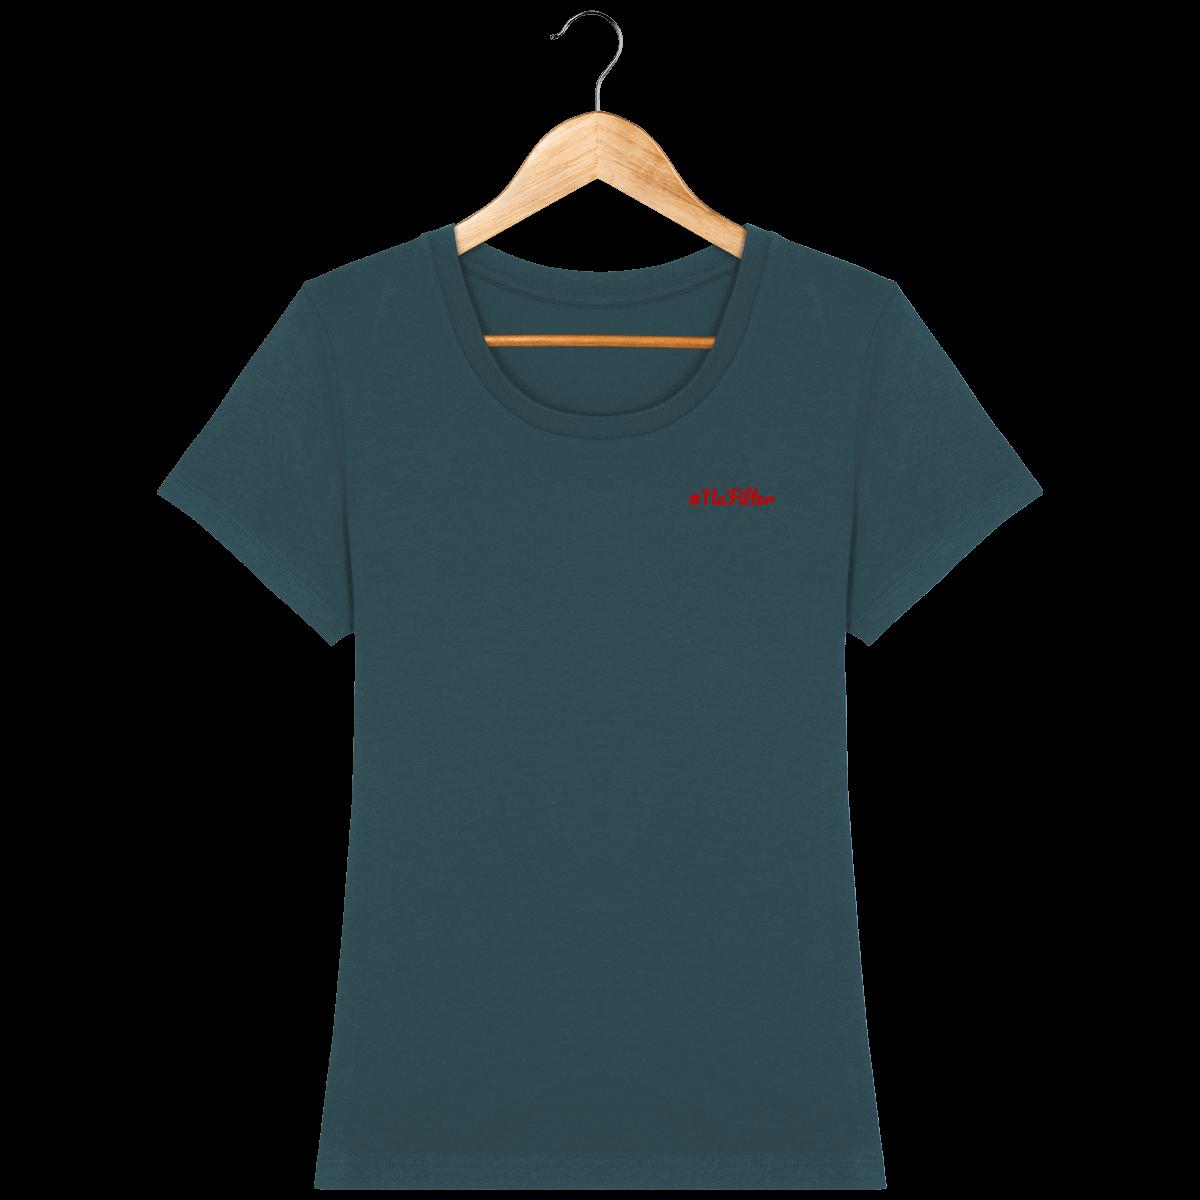 t-shirt-bio-brode-nofilter-black-red_stargazer_face